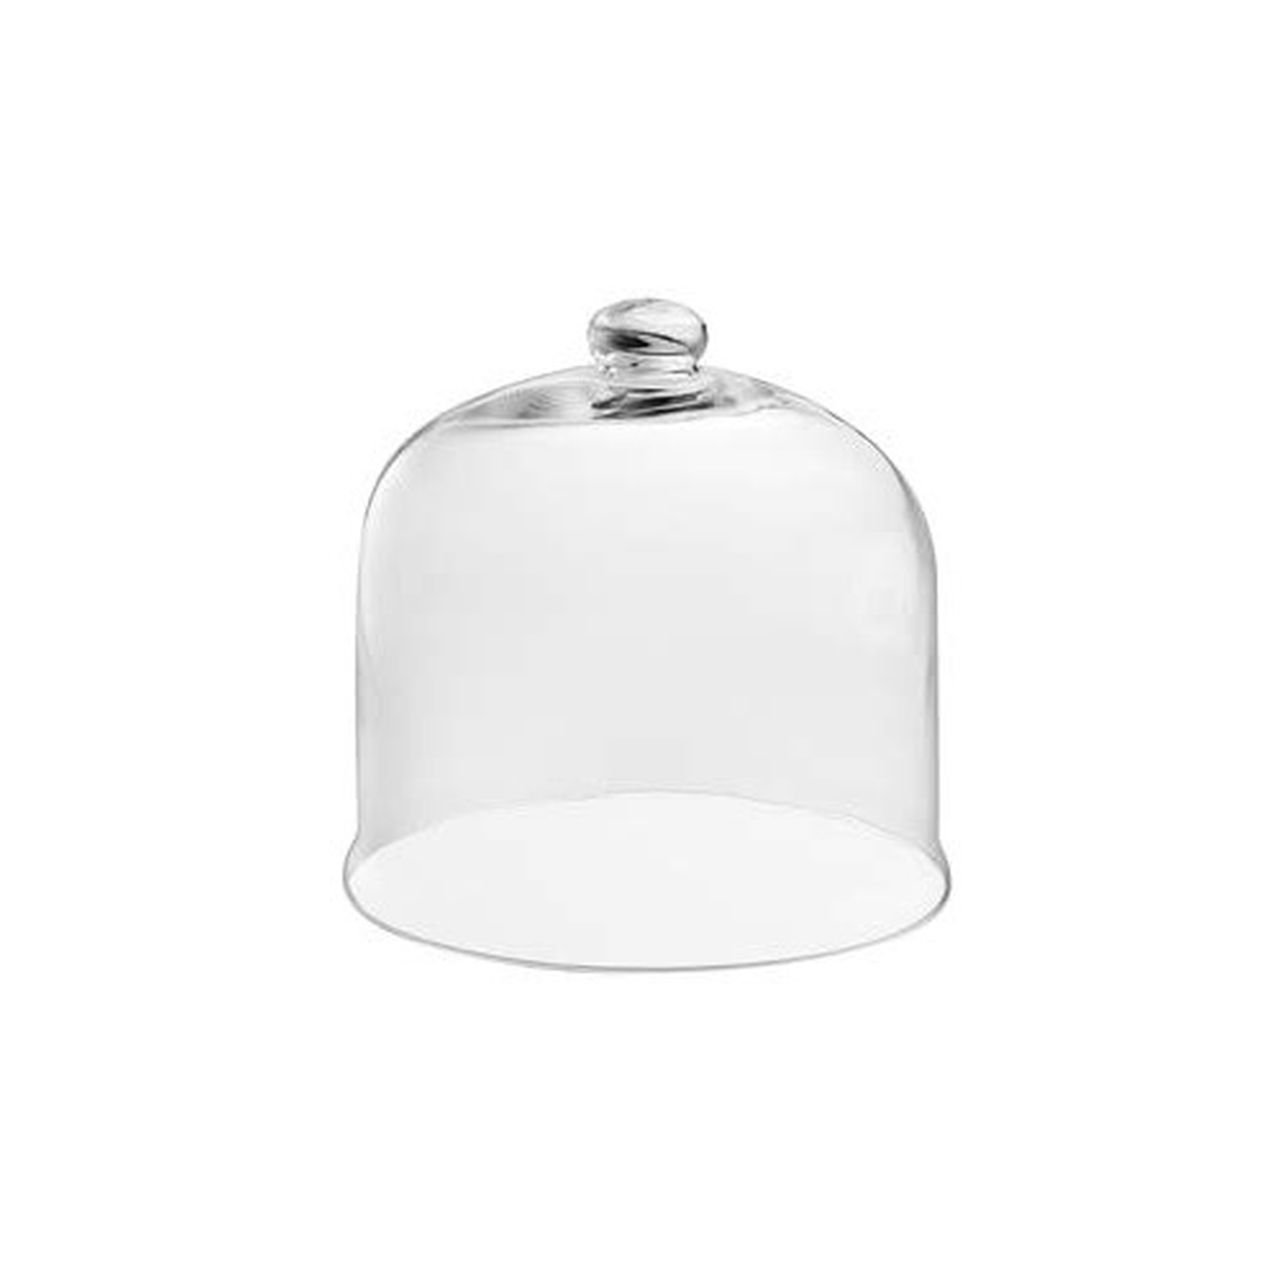 Unbekannt Hochgeblasene Glasglocke am Mund cod.CC00500LU cm 30h diam.30 by Varotto & Co.